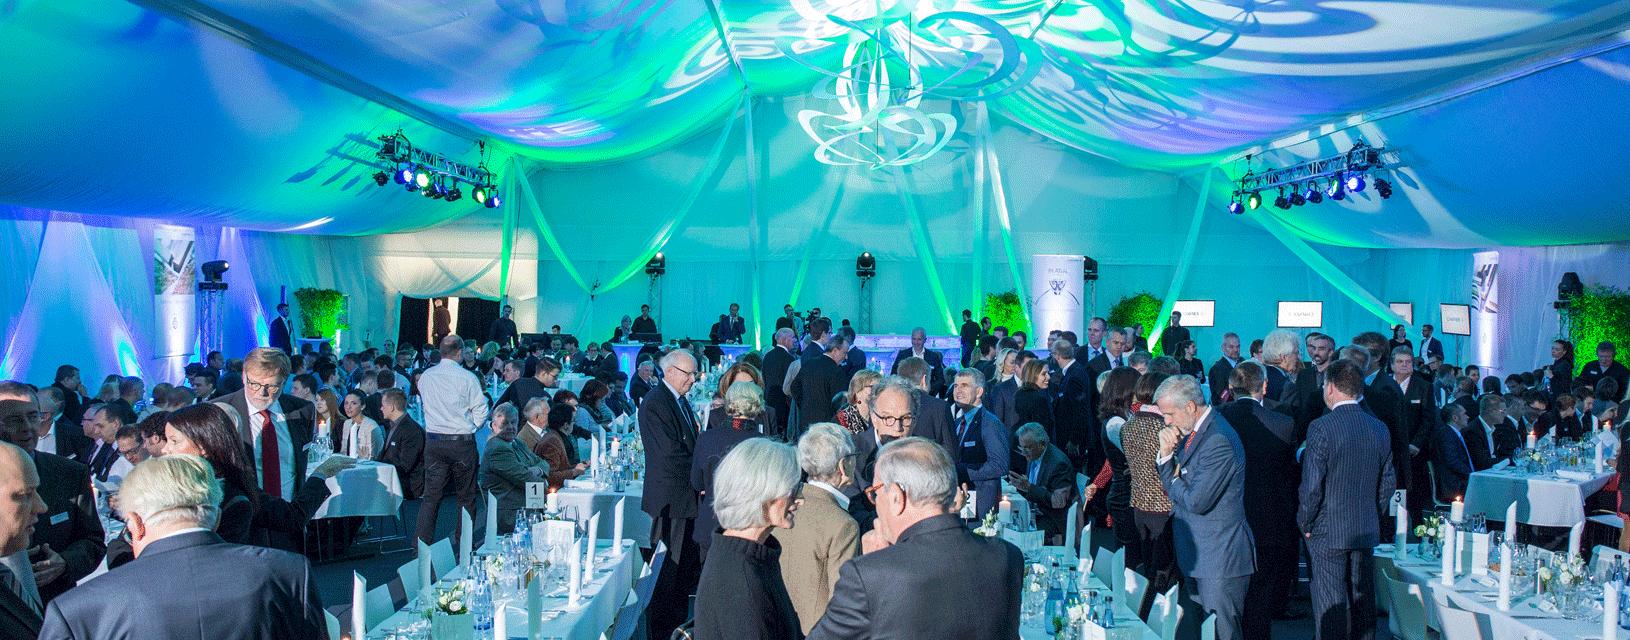 event-agentur-pforzheim-event